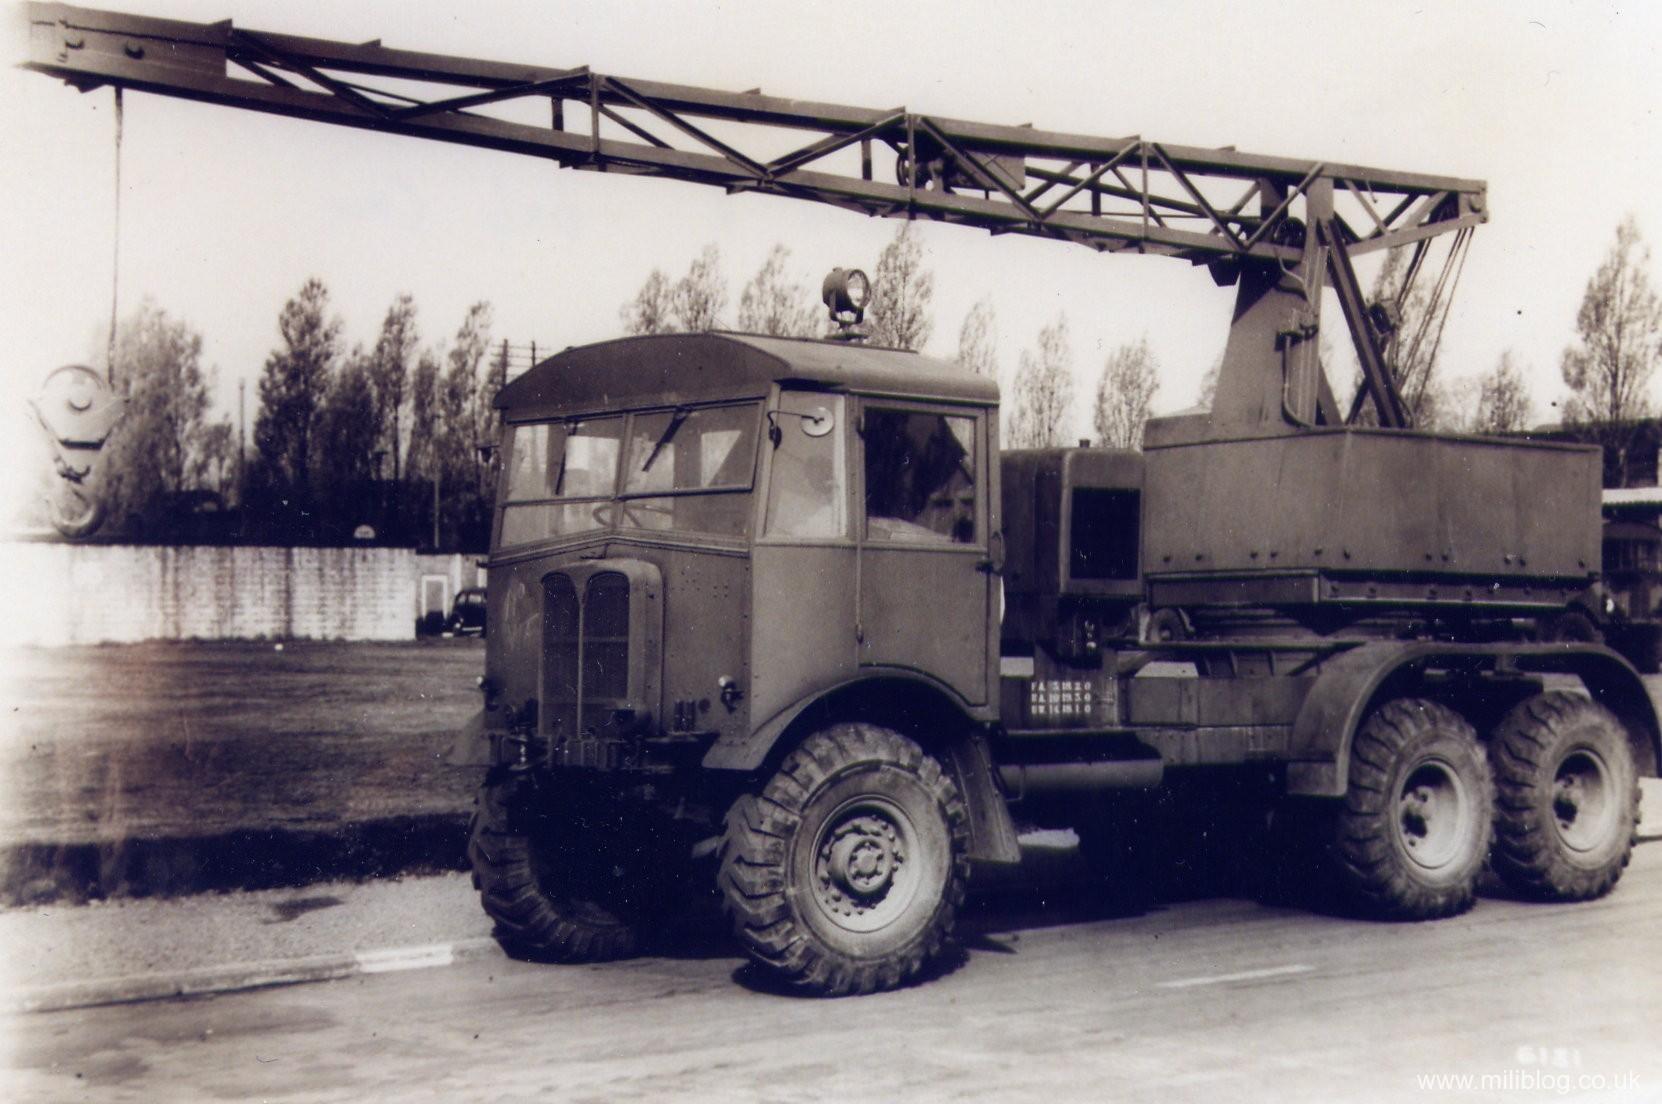 Military items | Military vehicles | Military trucks | Military